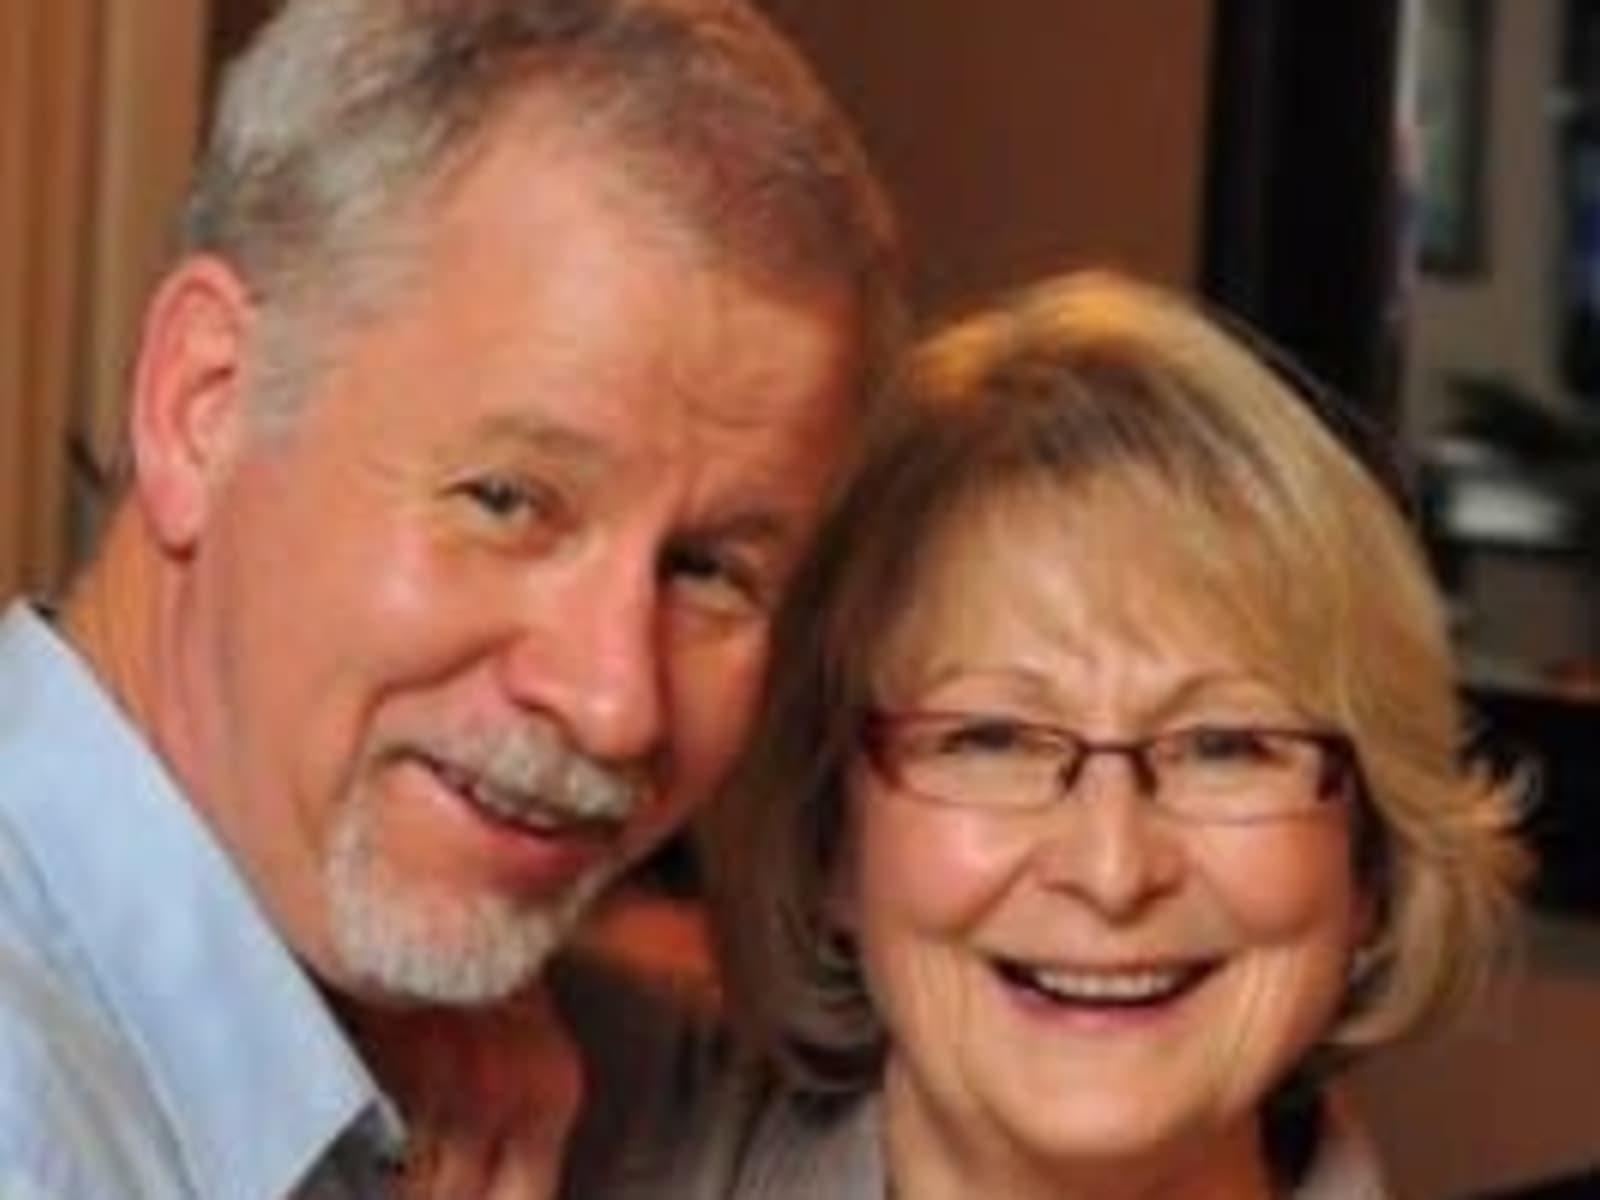 Karen & Jim from Victoria, British Columbia, Canada